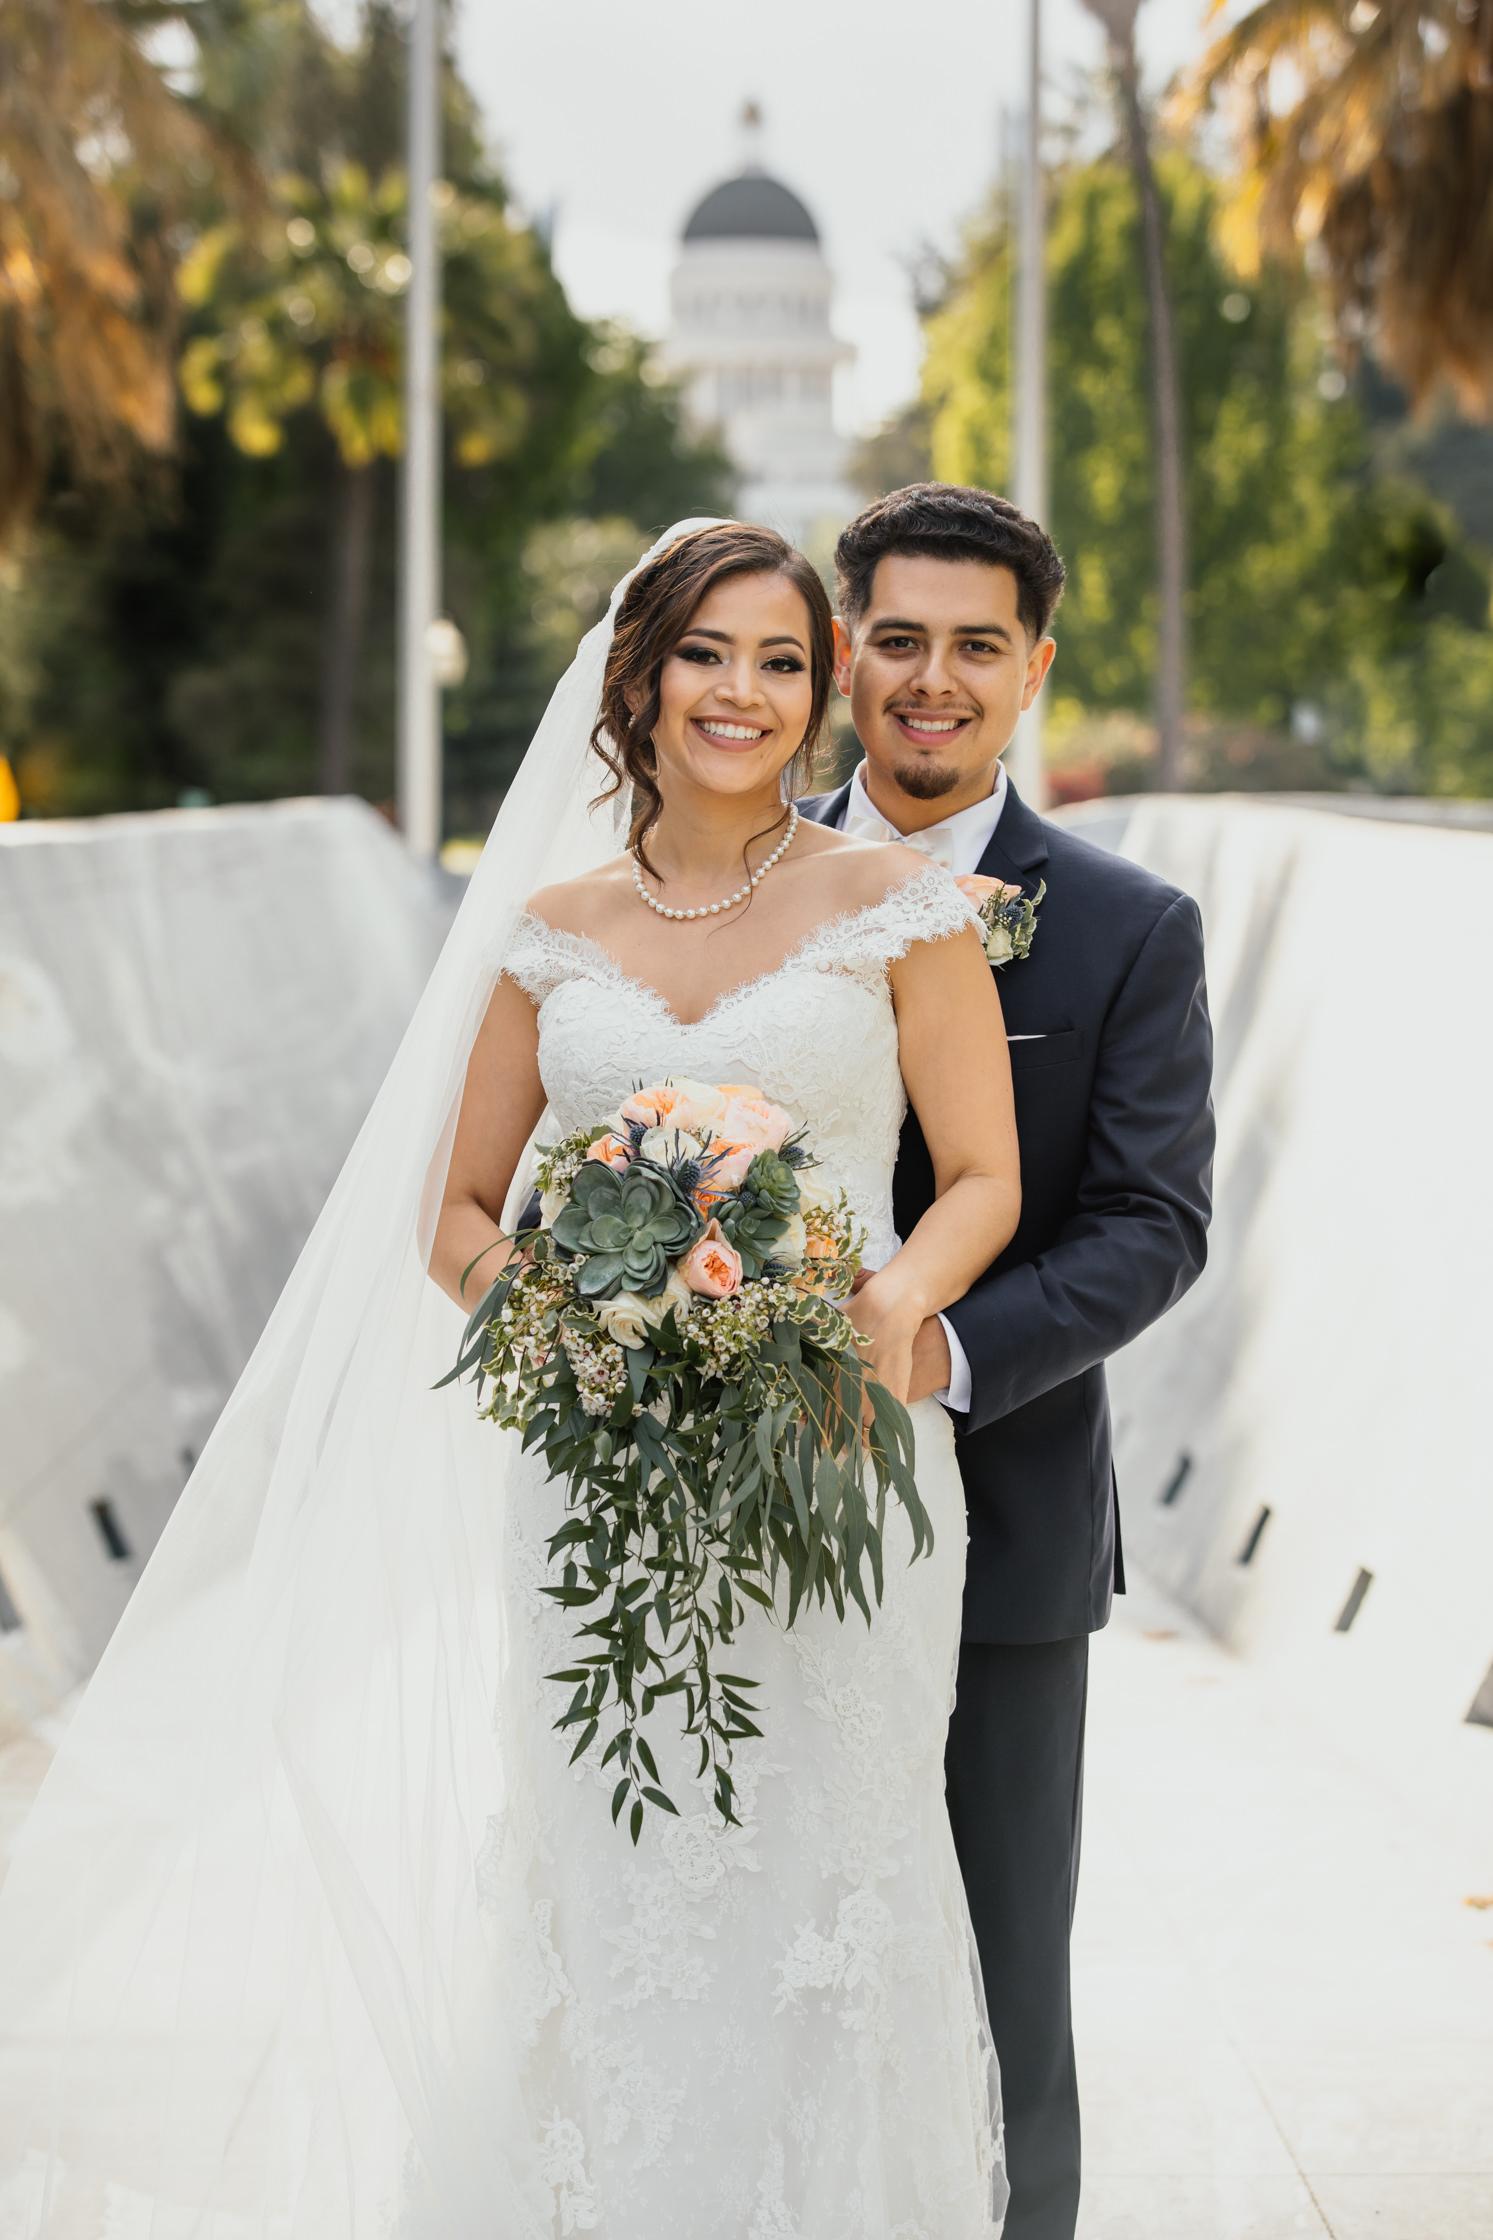 luis_joanna_wedding-66.jpg